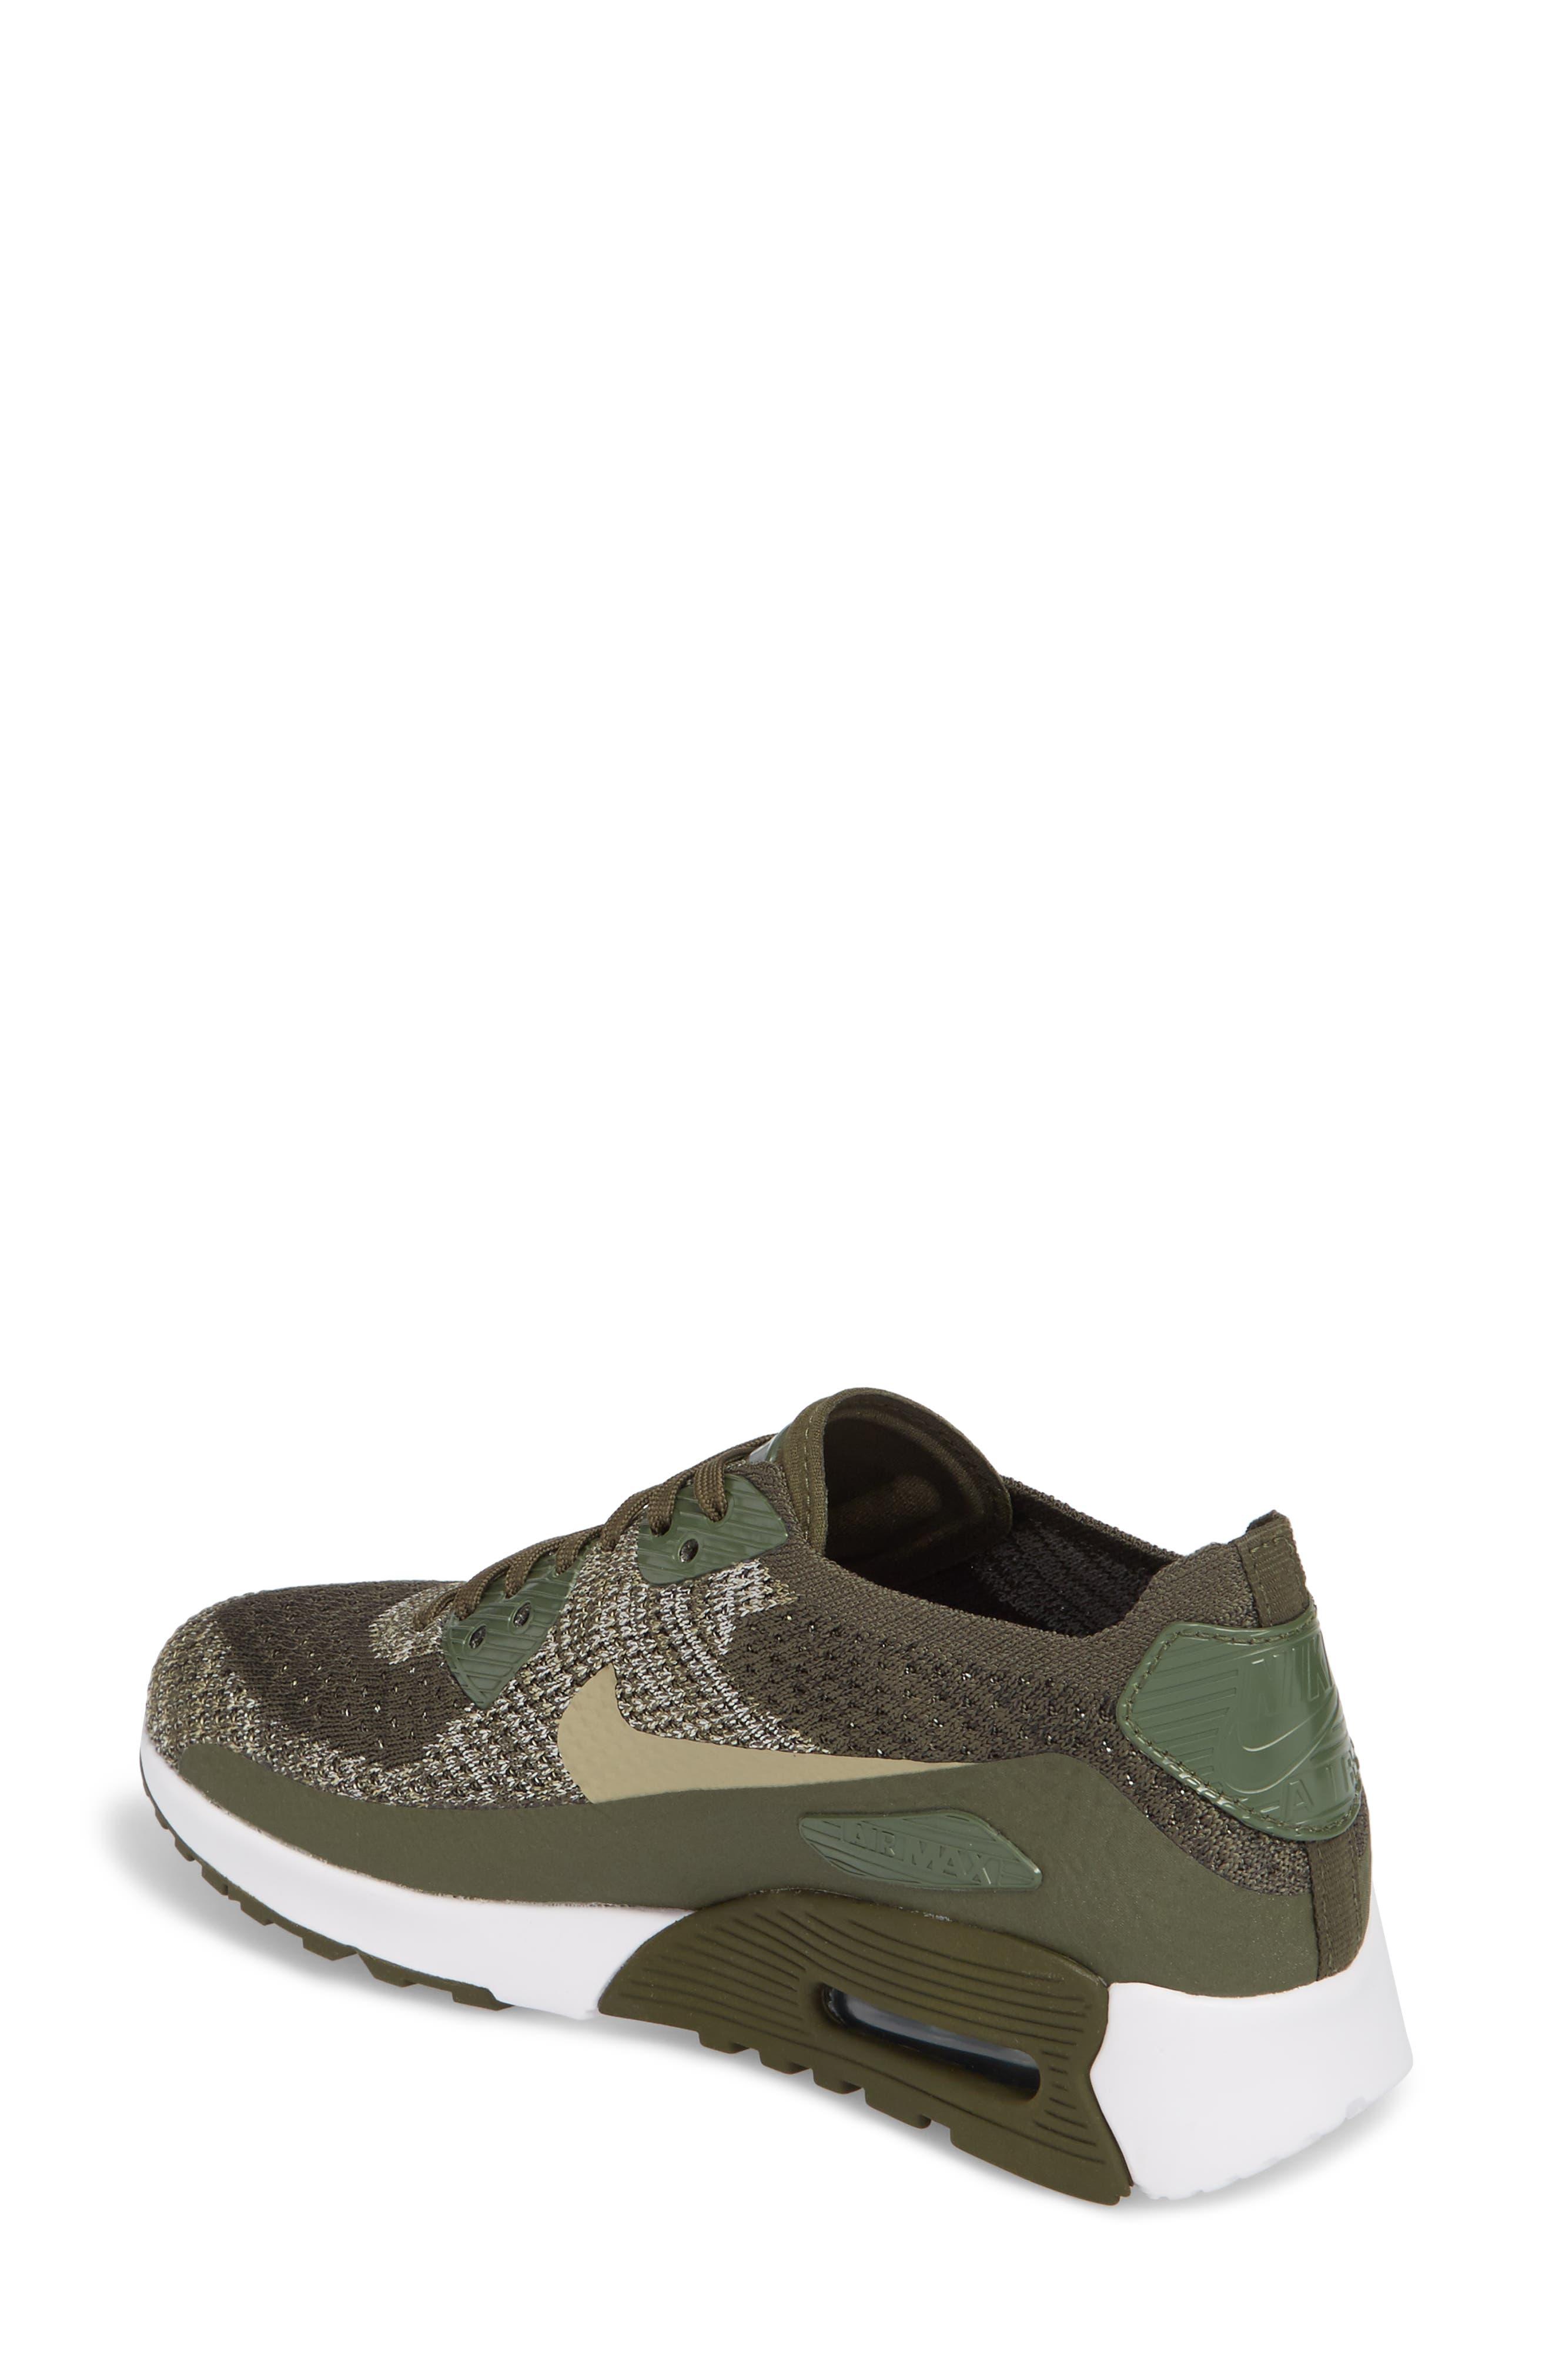 Air Max 90 Flyknit Ultra 2.0 Sneaker,                             Alternate thumbnail 2, color,                             Cargo Khaki/ Neutral Olive